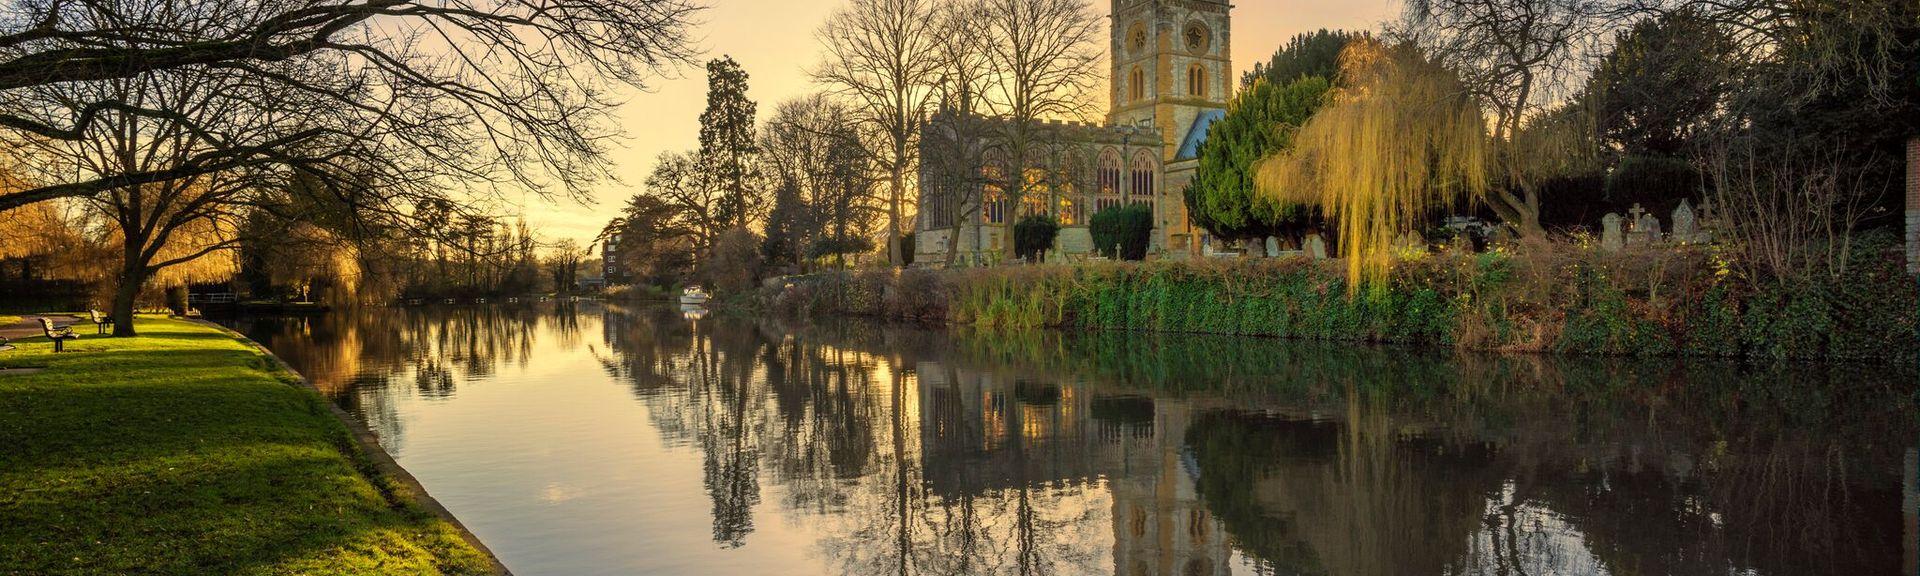 Stratford-upon-Avon, Anglia, Wielka Brytania